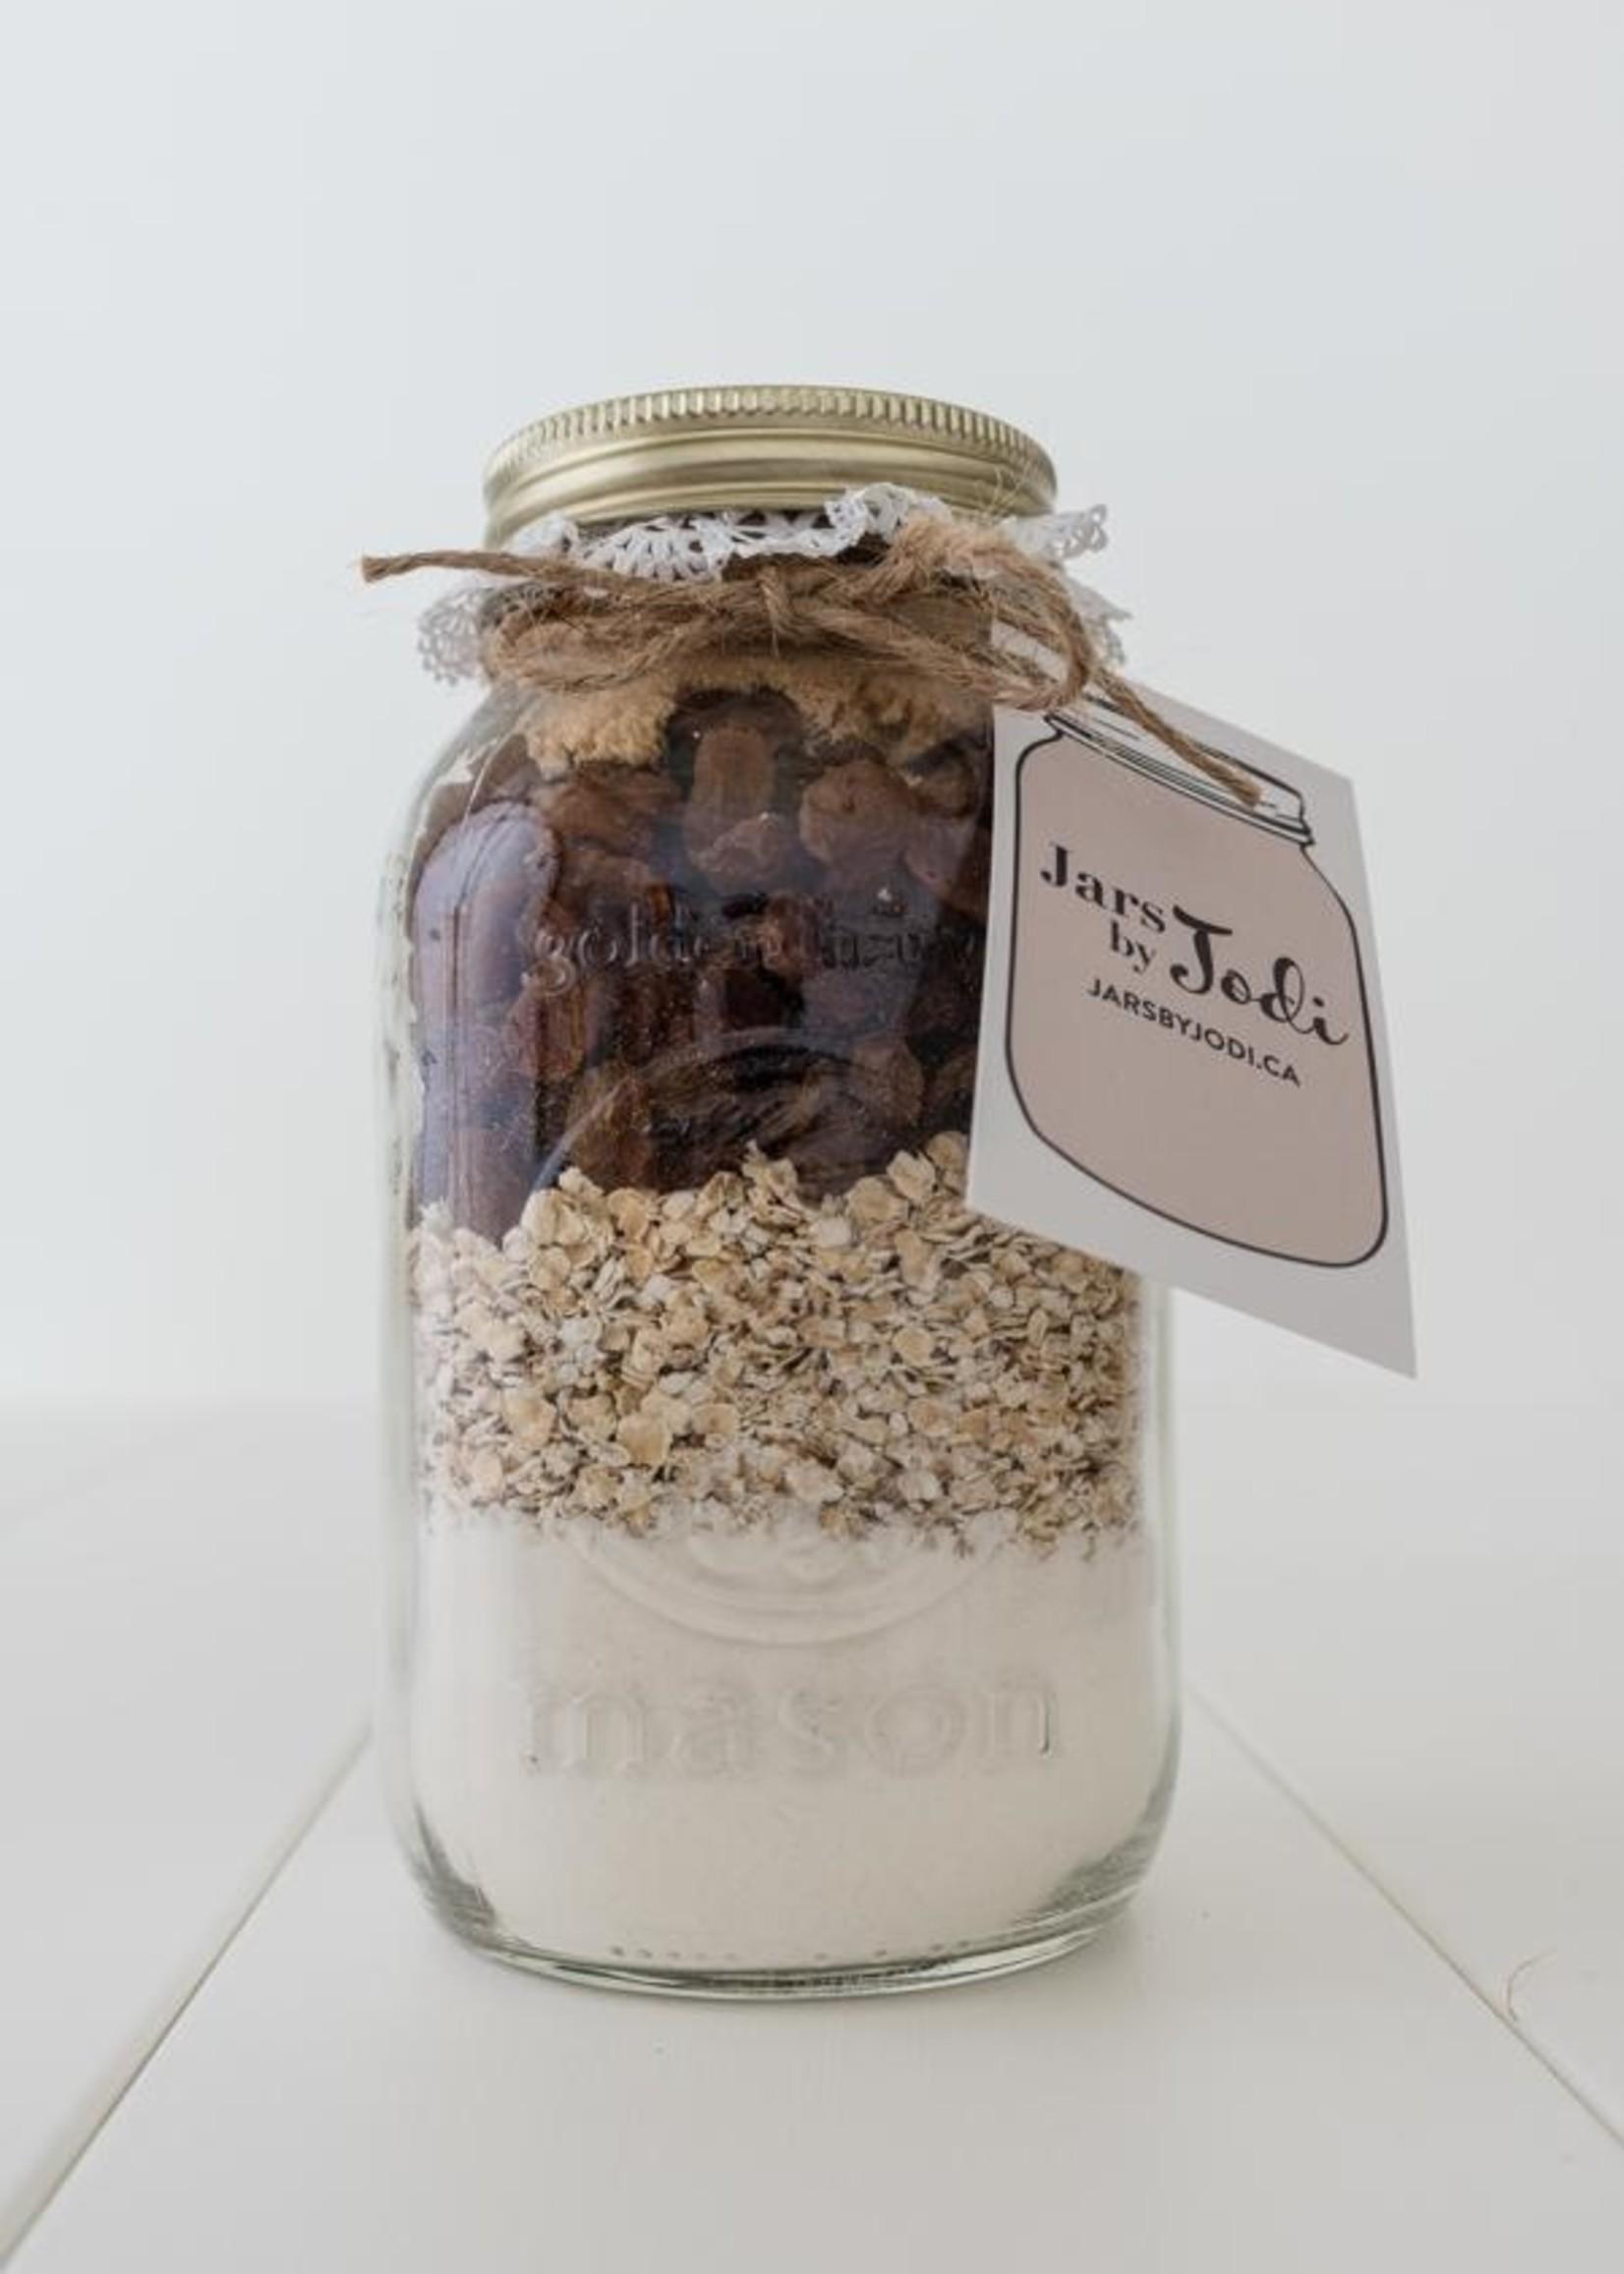 Jars By Jodi Oatmeal Raisin Cookies | Regular